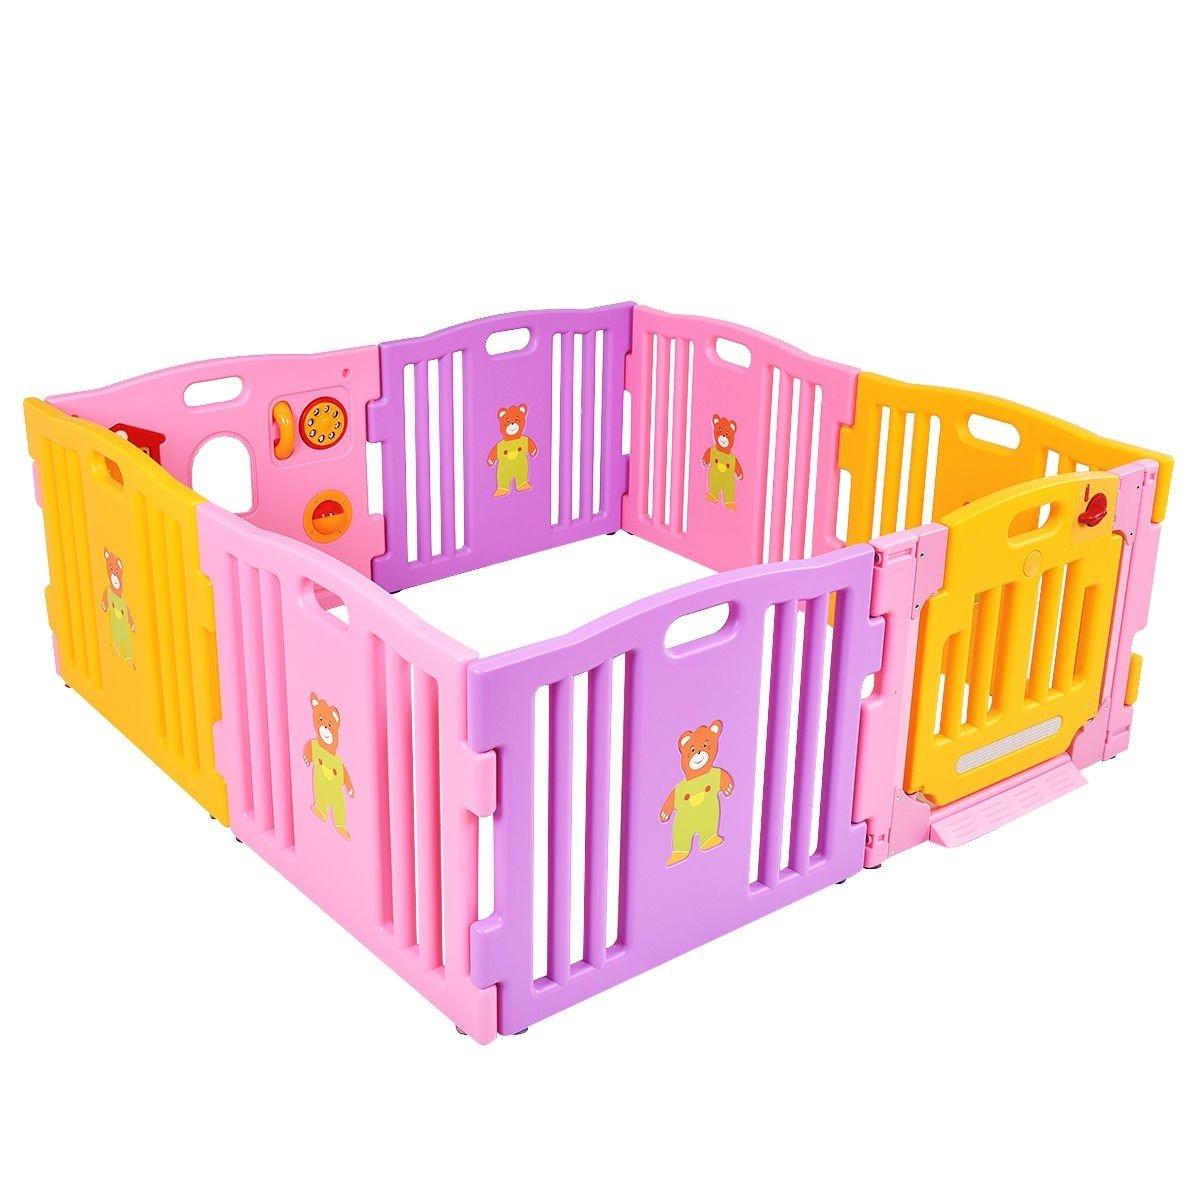 Pink 8 Panel Baby Playpen Kids Safety Play Center Center Yard Pink Indoor CHOOSEandBUY by CHOOSEandBUY (Image #3)